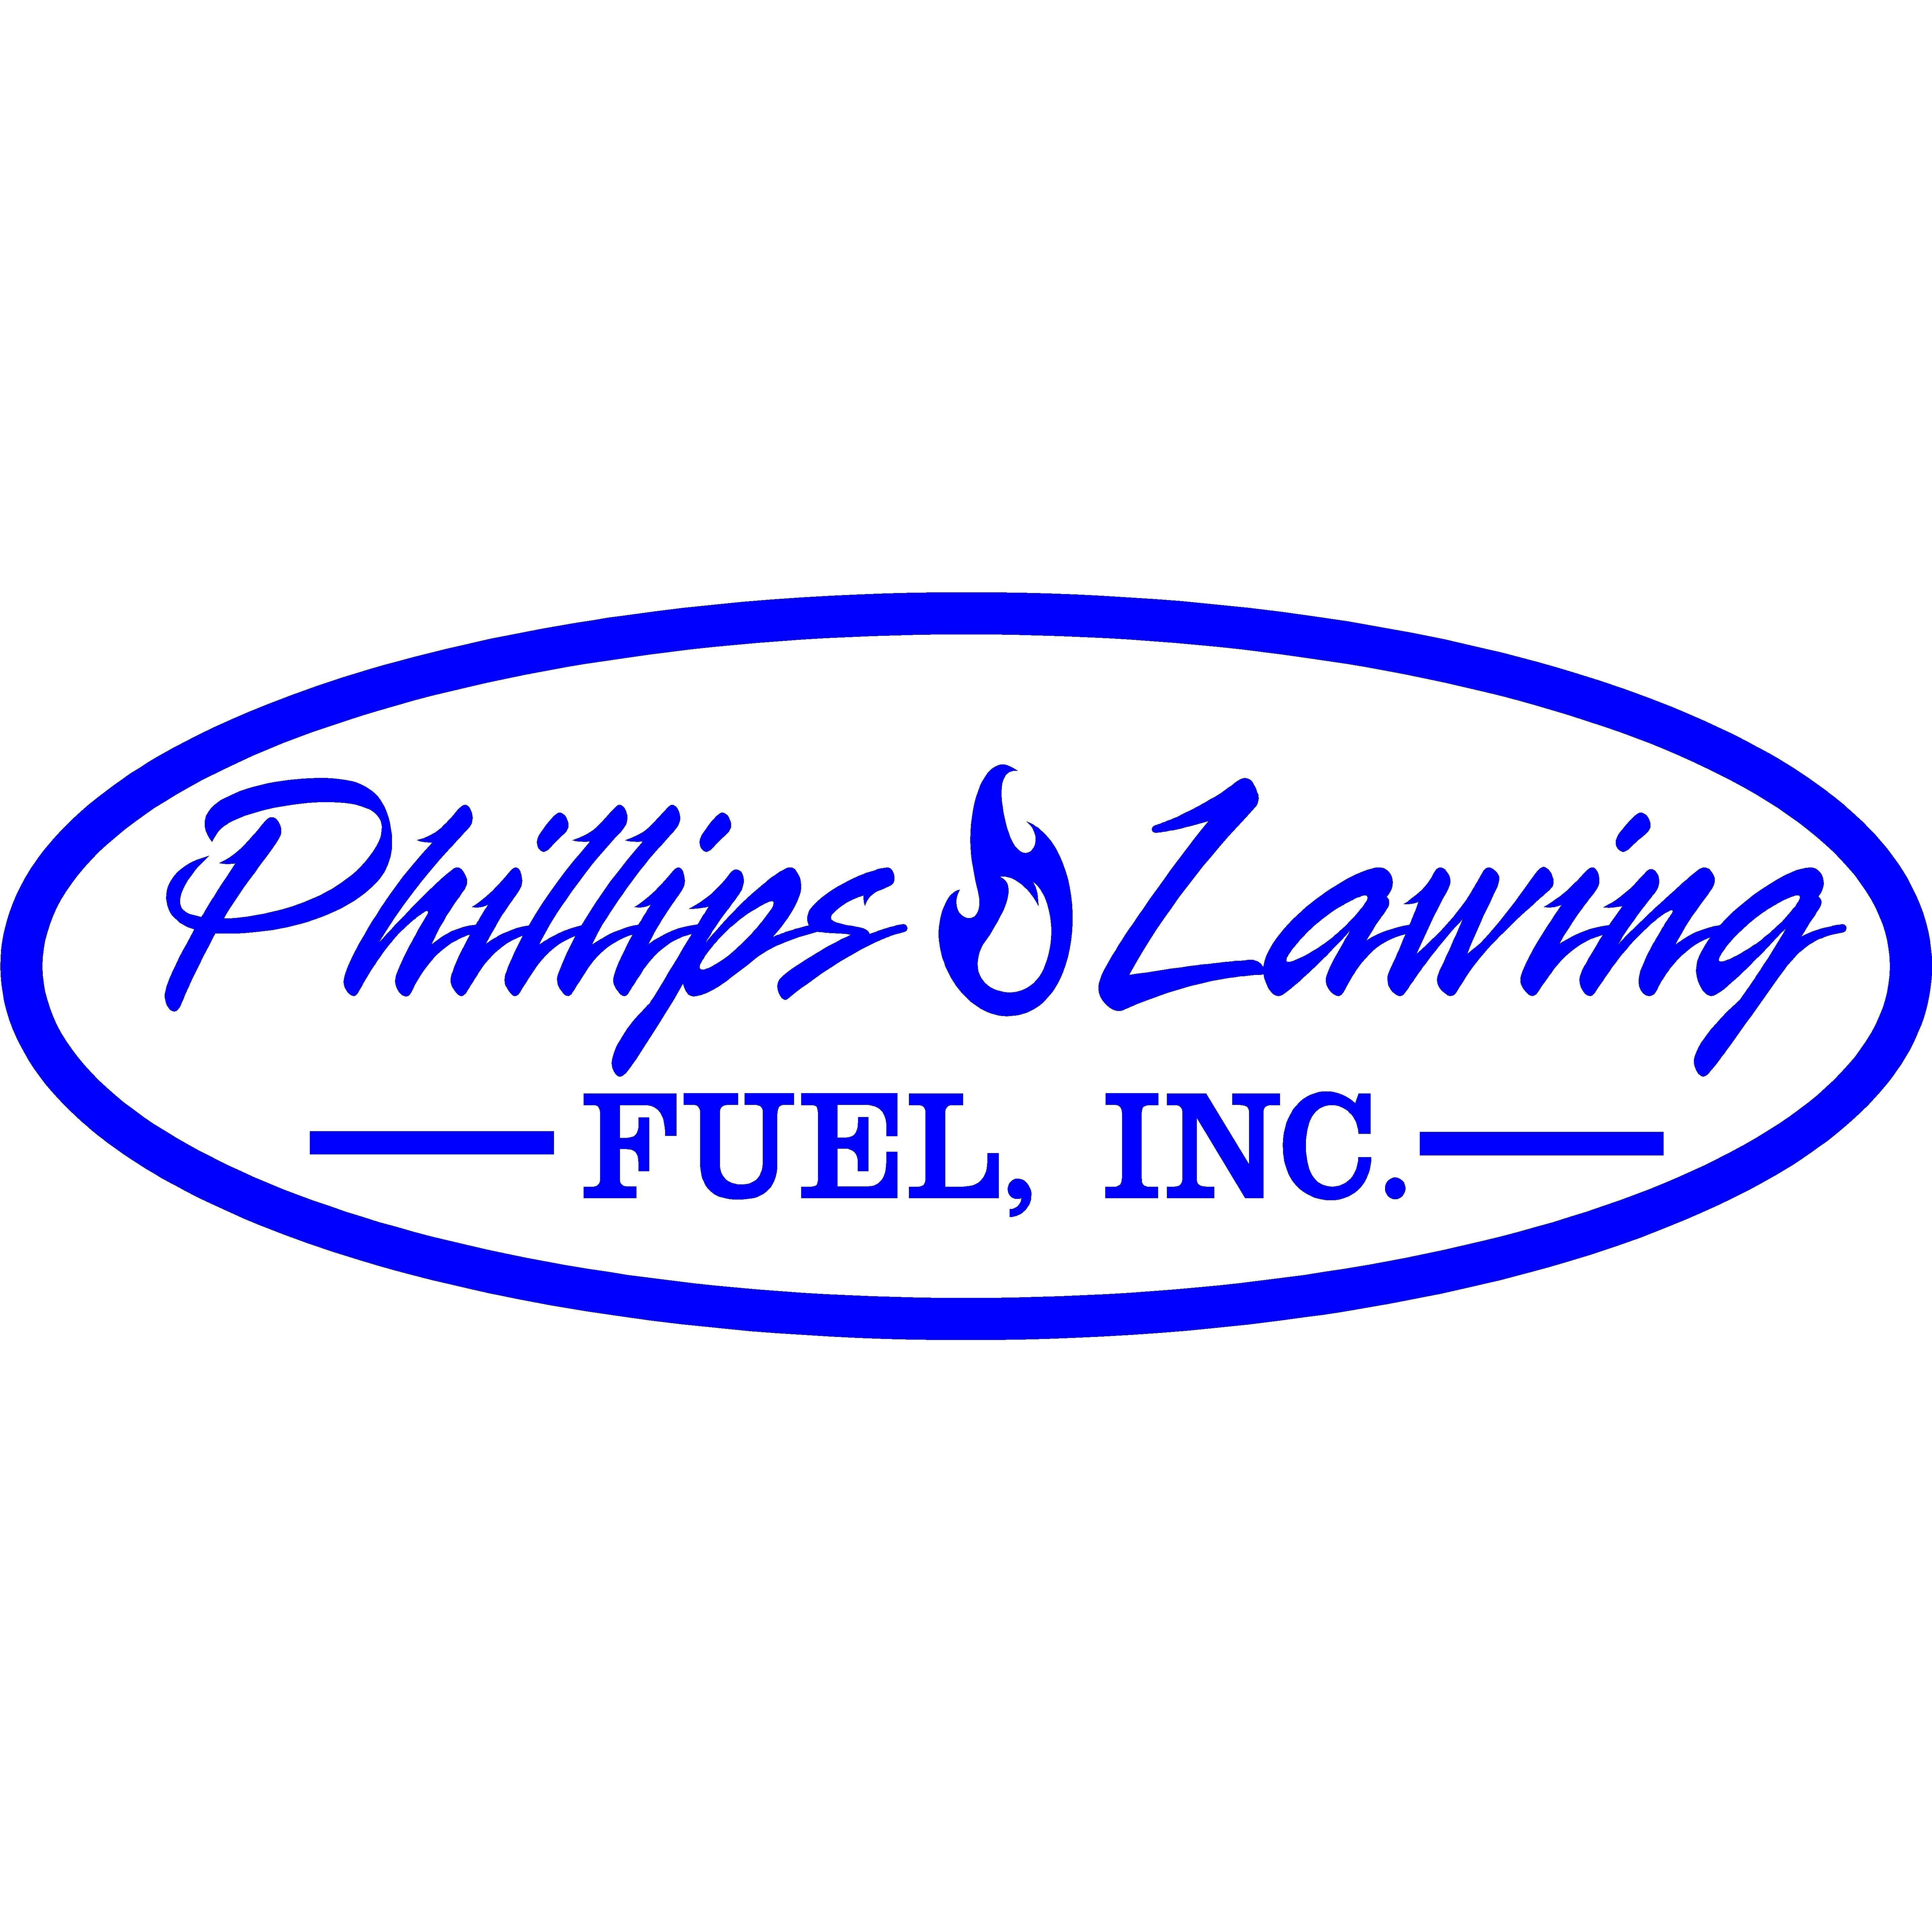 Phillips - Lawing Fuel, Inc.